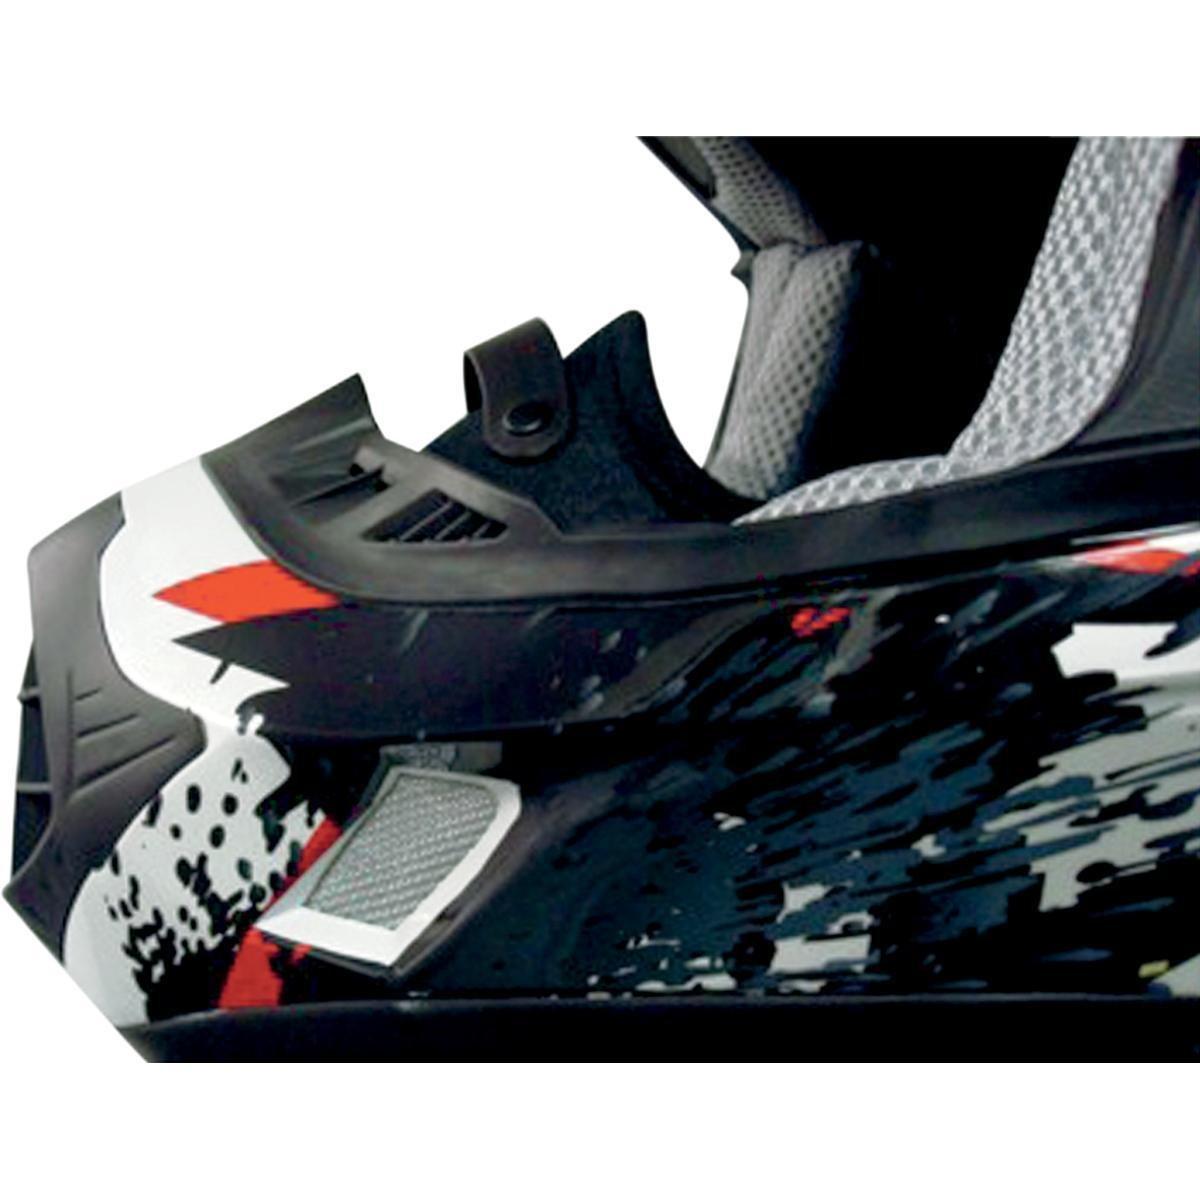 Black 0134-1060 AFX Helmet Breath Guard for FX-90